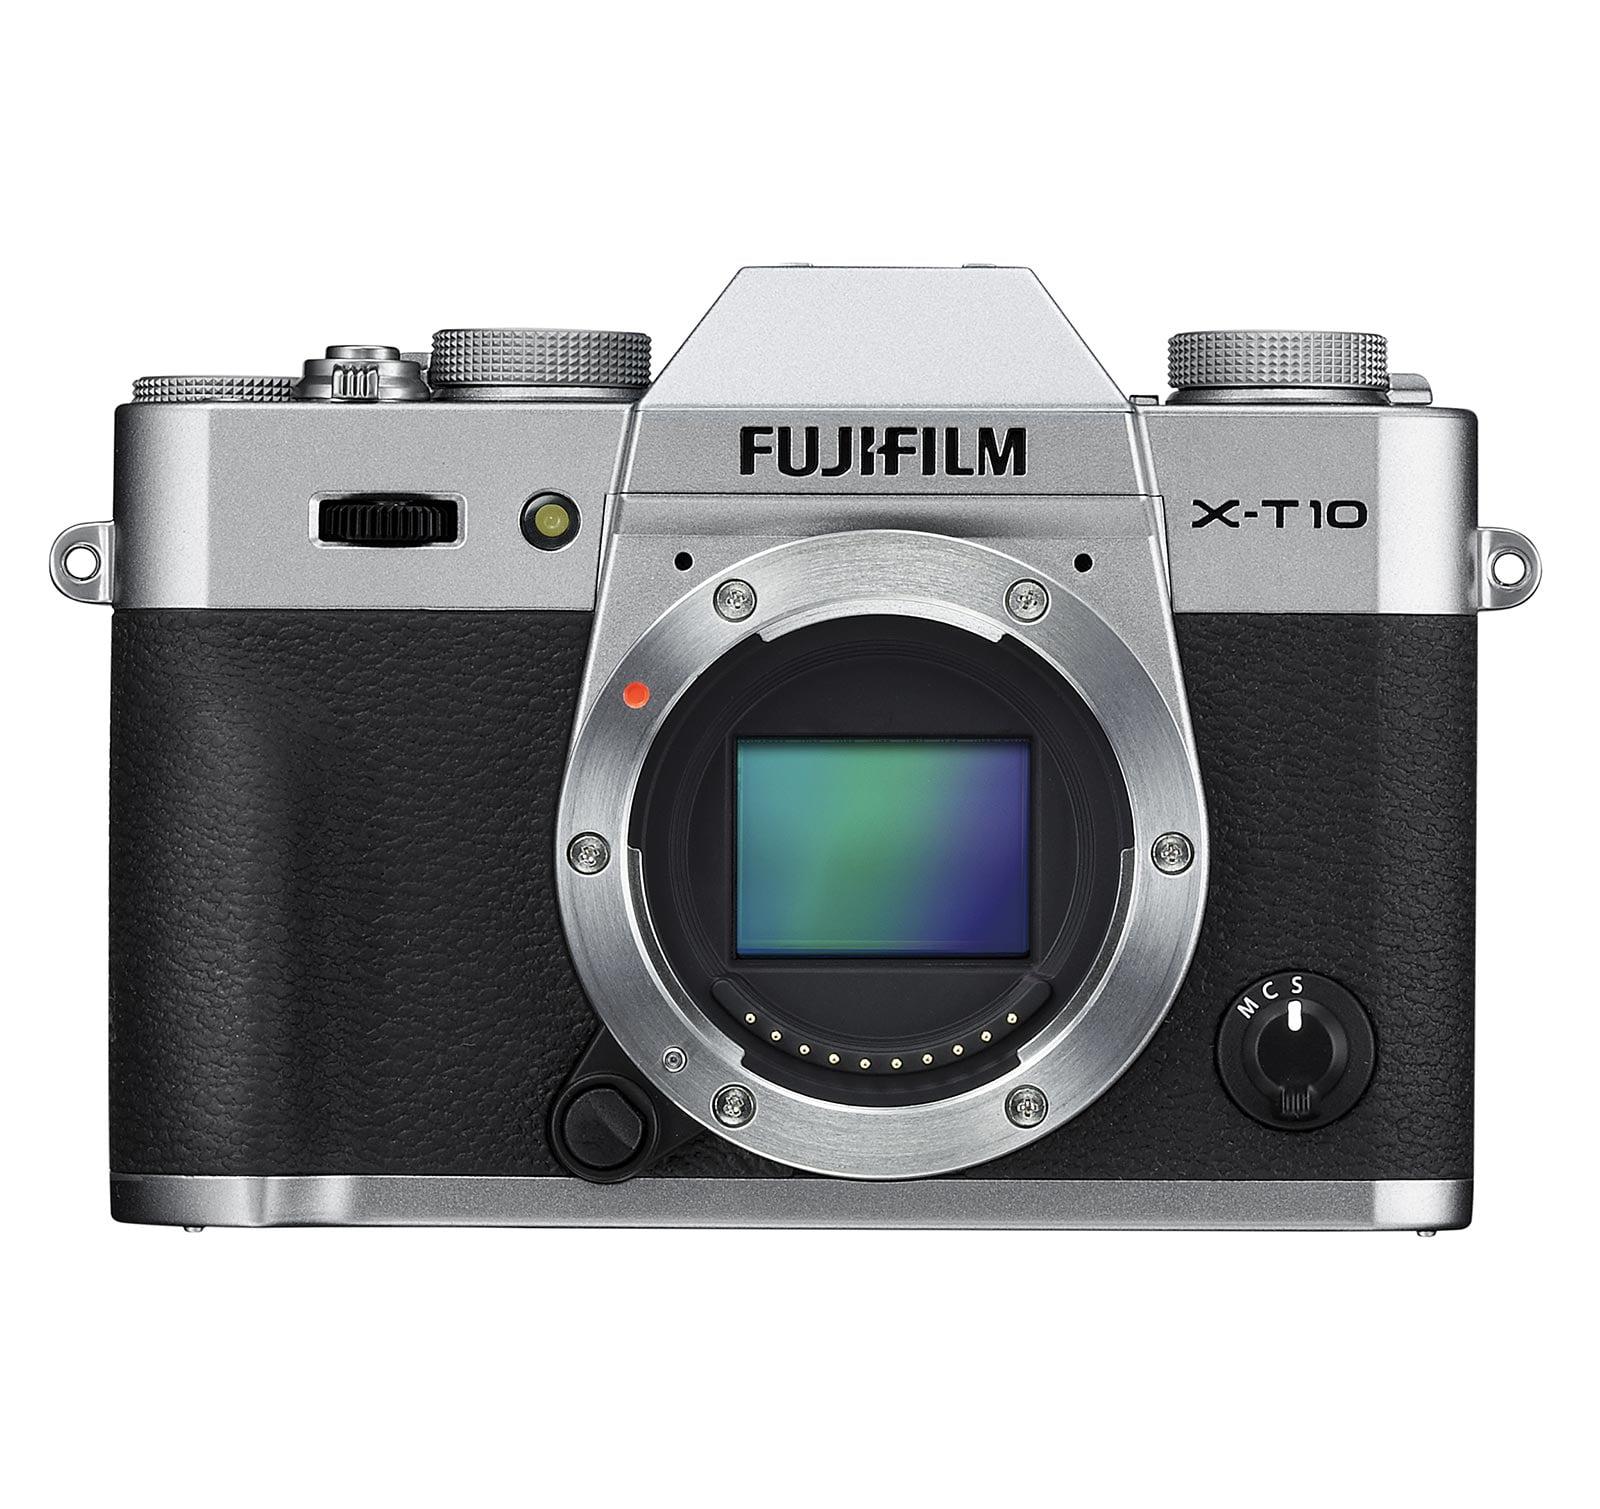 Fujifilm 16470817 X-T10 Mirrorless Camera (Body Only) Silver